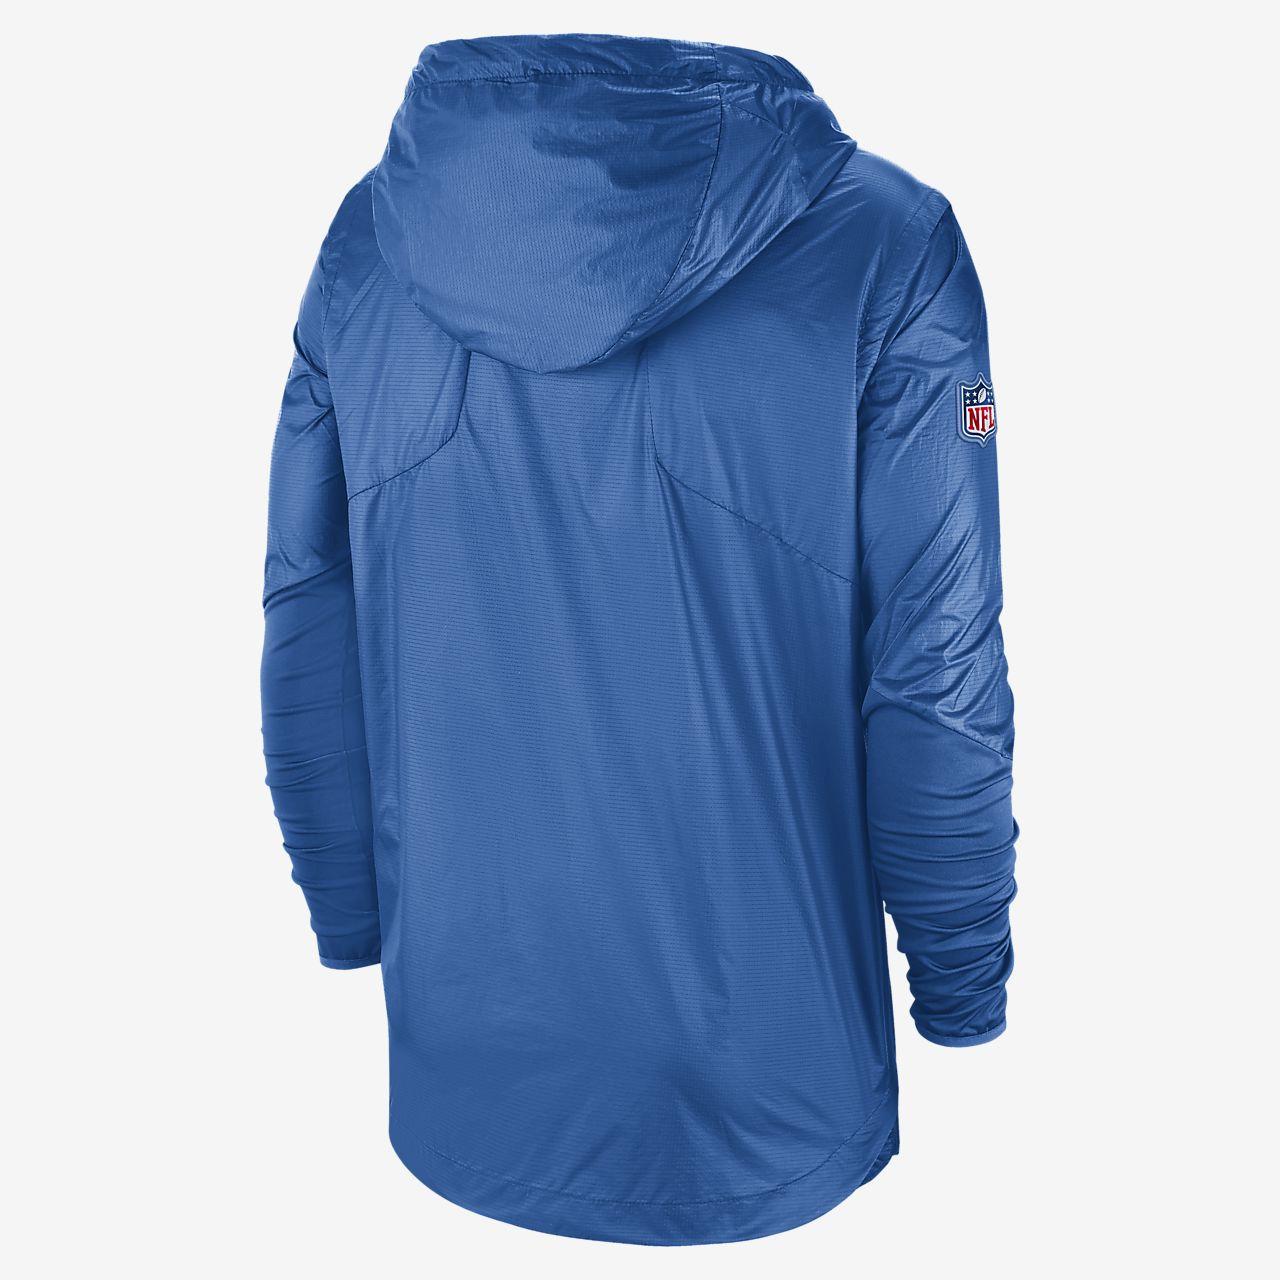 bd878f2b5 Nike Alpha Fly Rush (NFL Lions) Men s Jacket. Nike.com